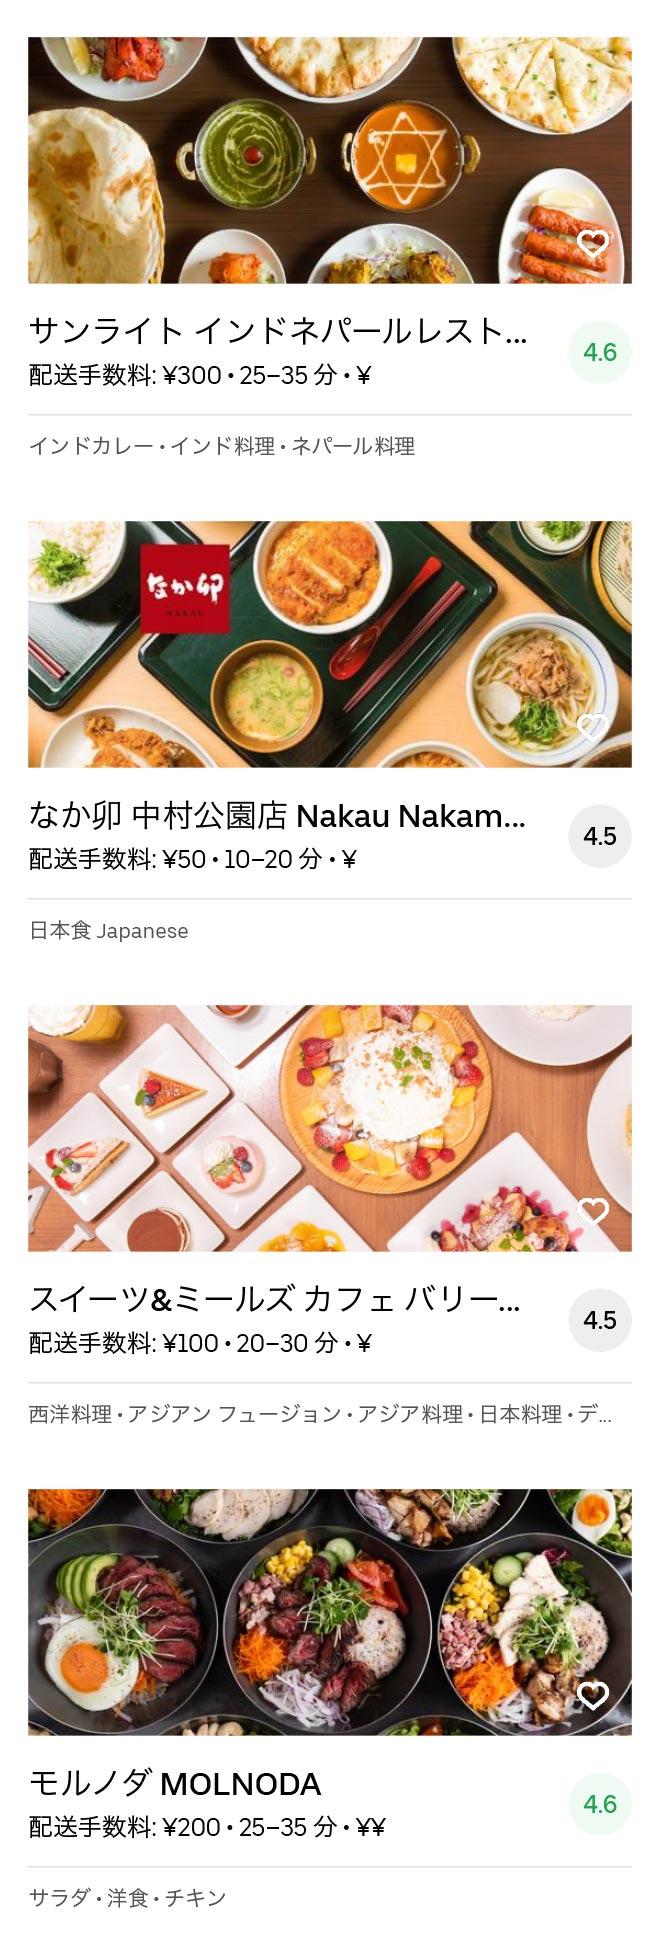 Nagoya nakamura menu 2005 07